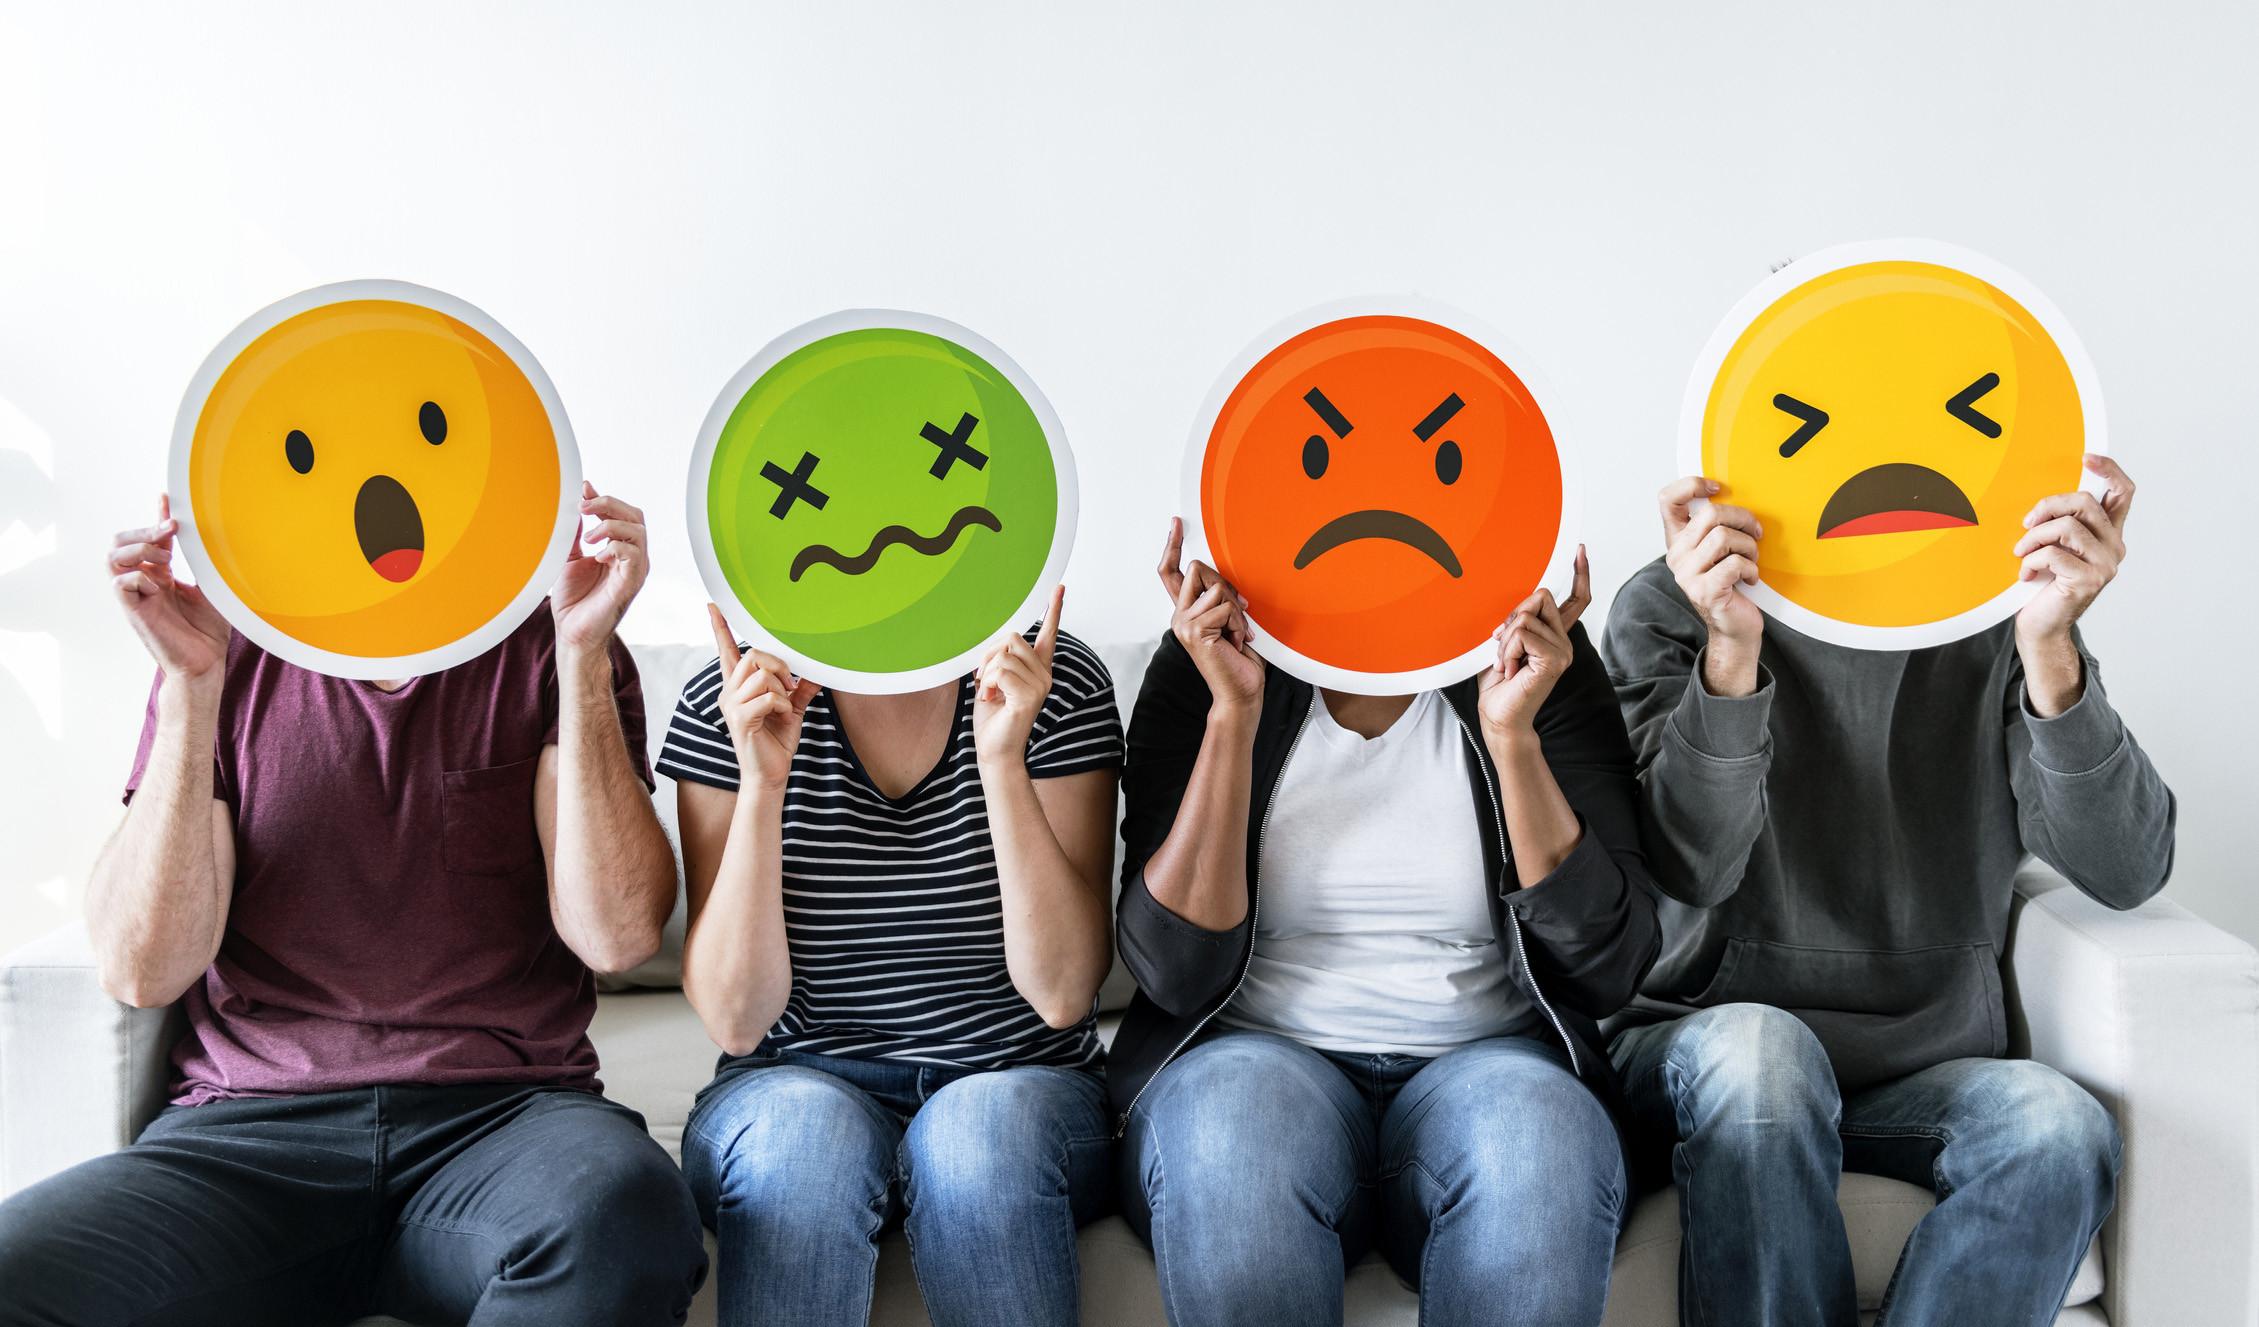 los emojis no son lenguaje universal